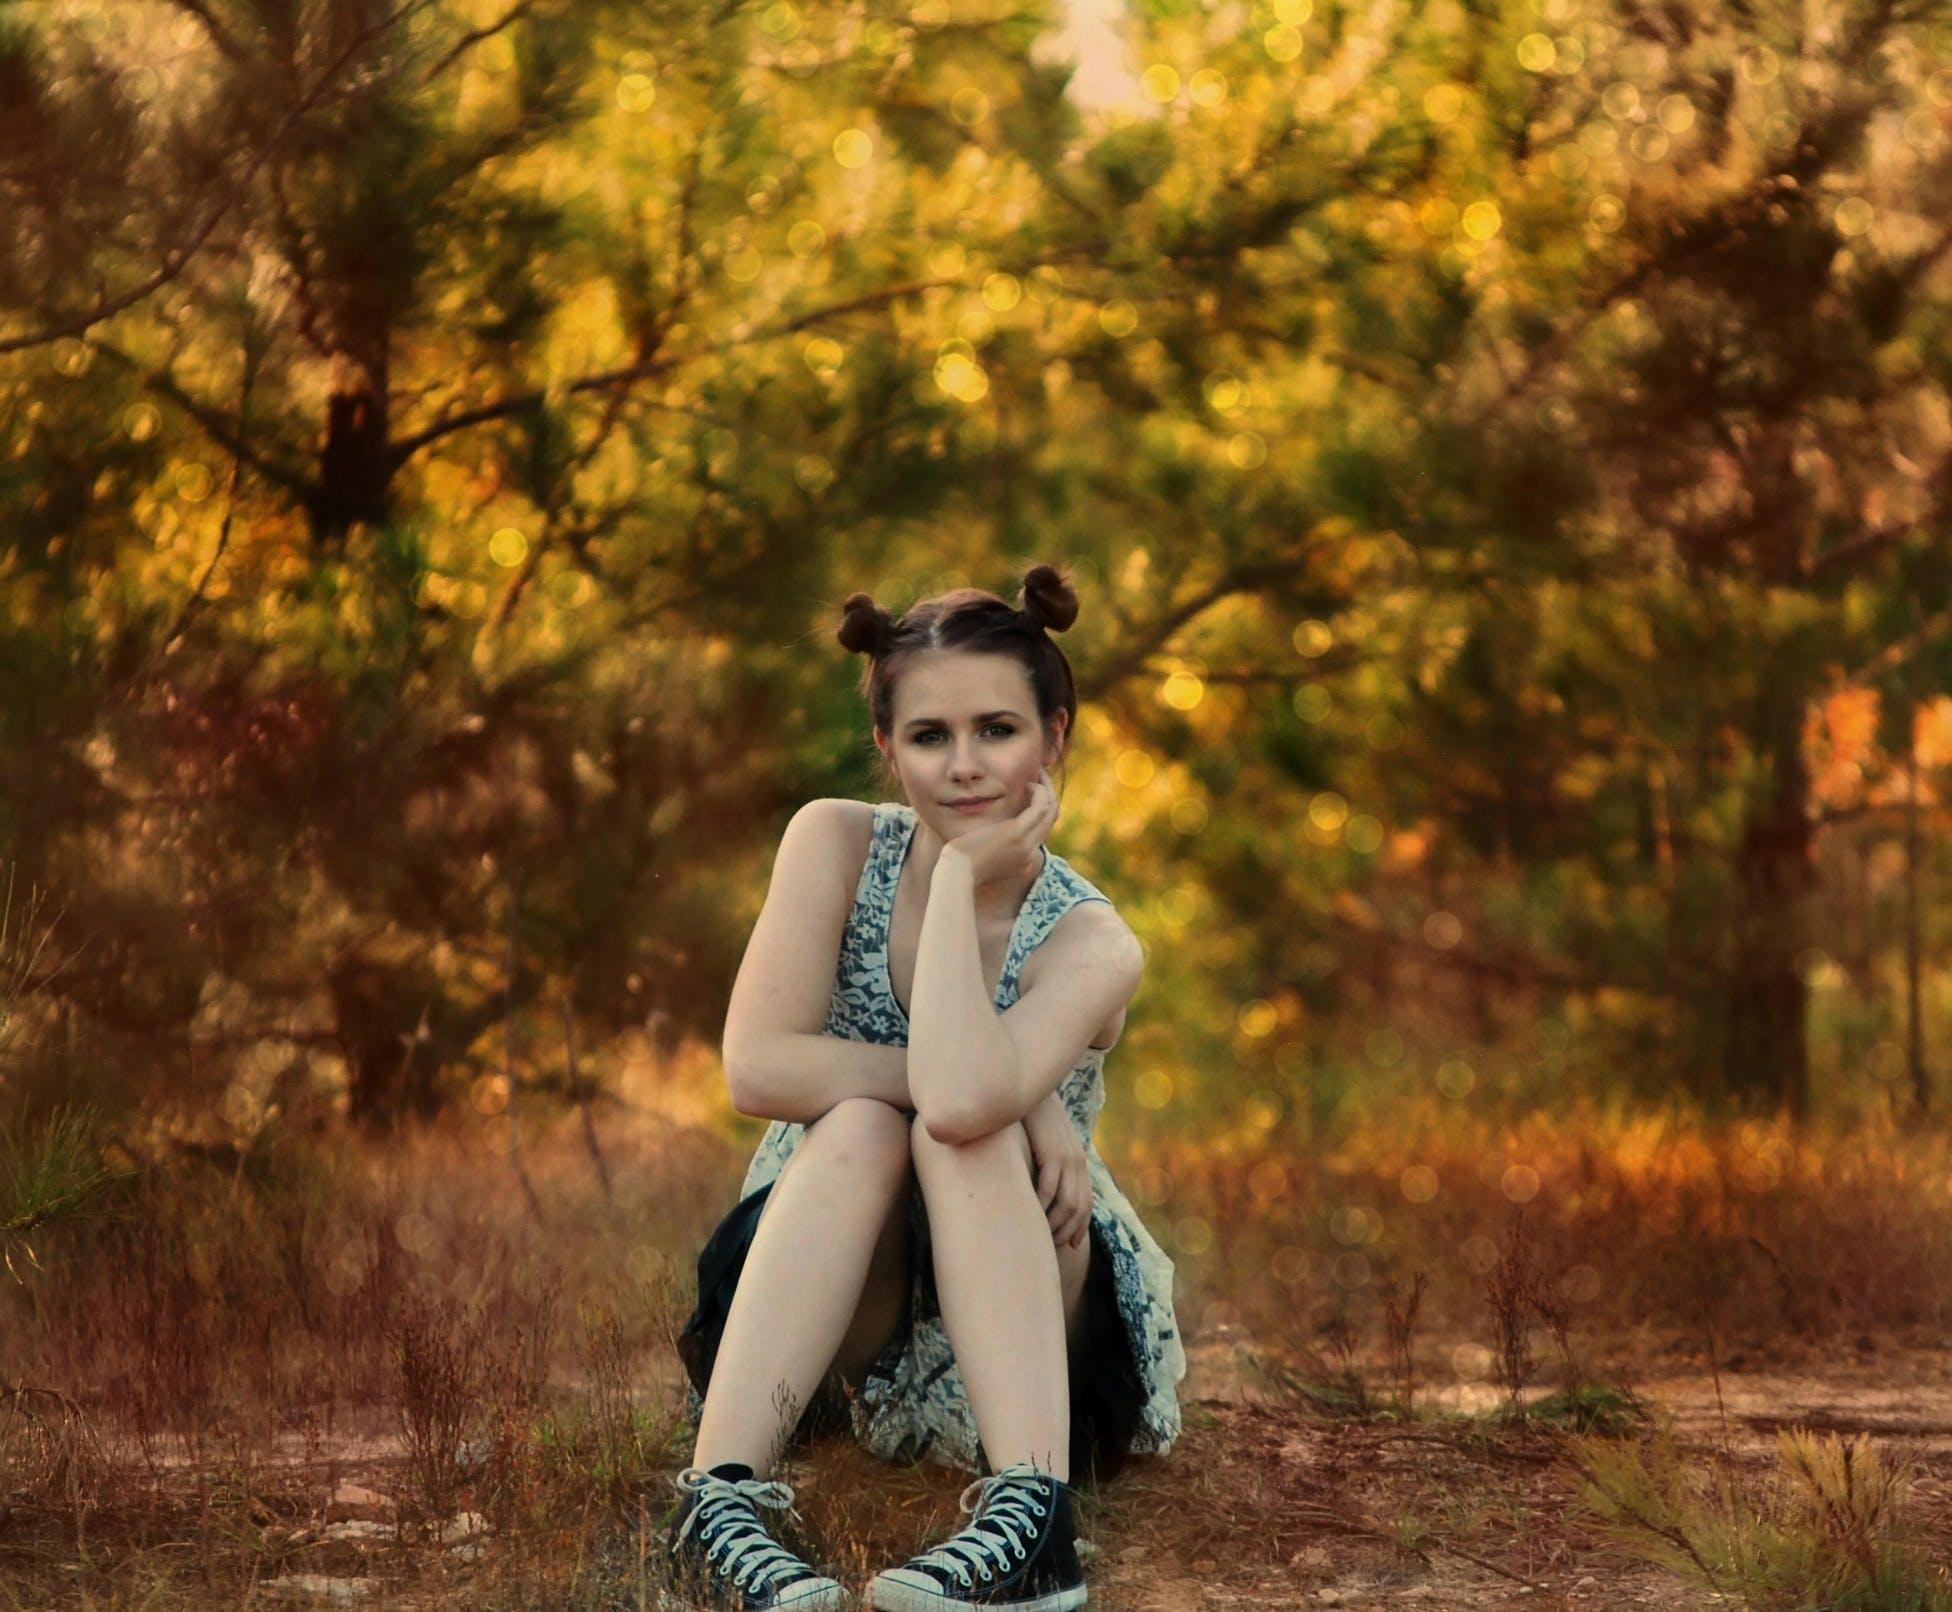 Girl Wearing Gray Dress Sitting on Ground